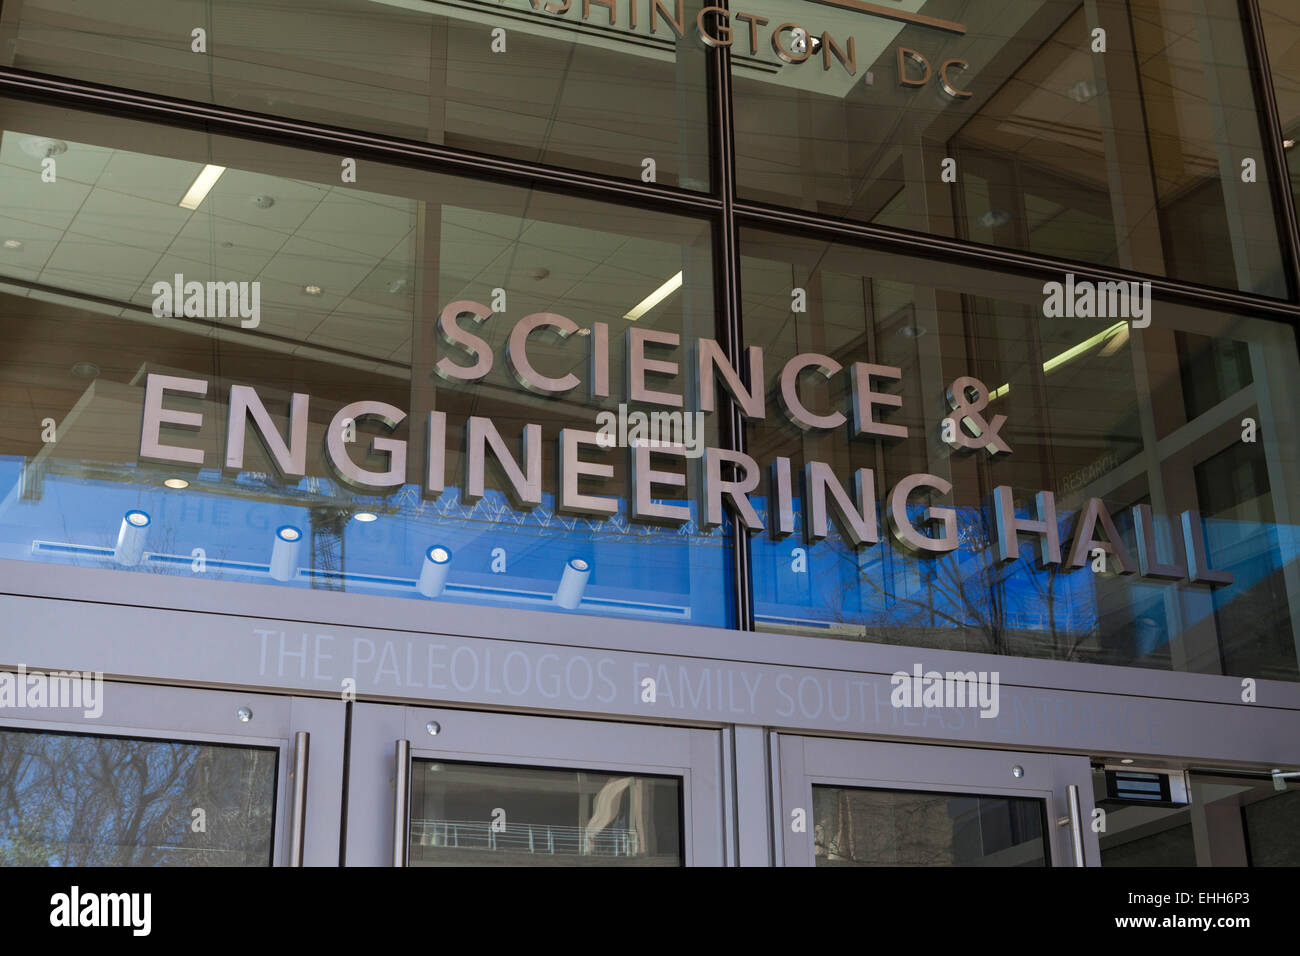 George Washington University Science and Engineering building - Washington DC, Stati Uniti d'America Immagini Stock